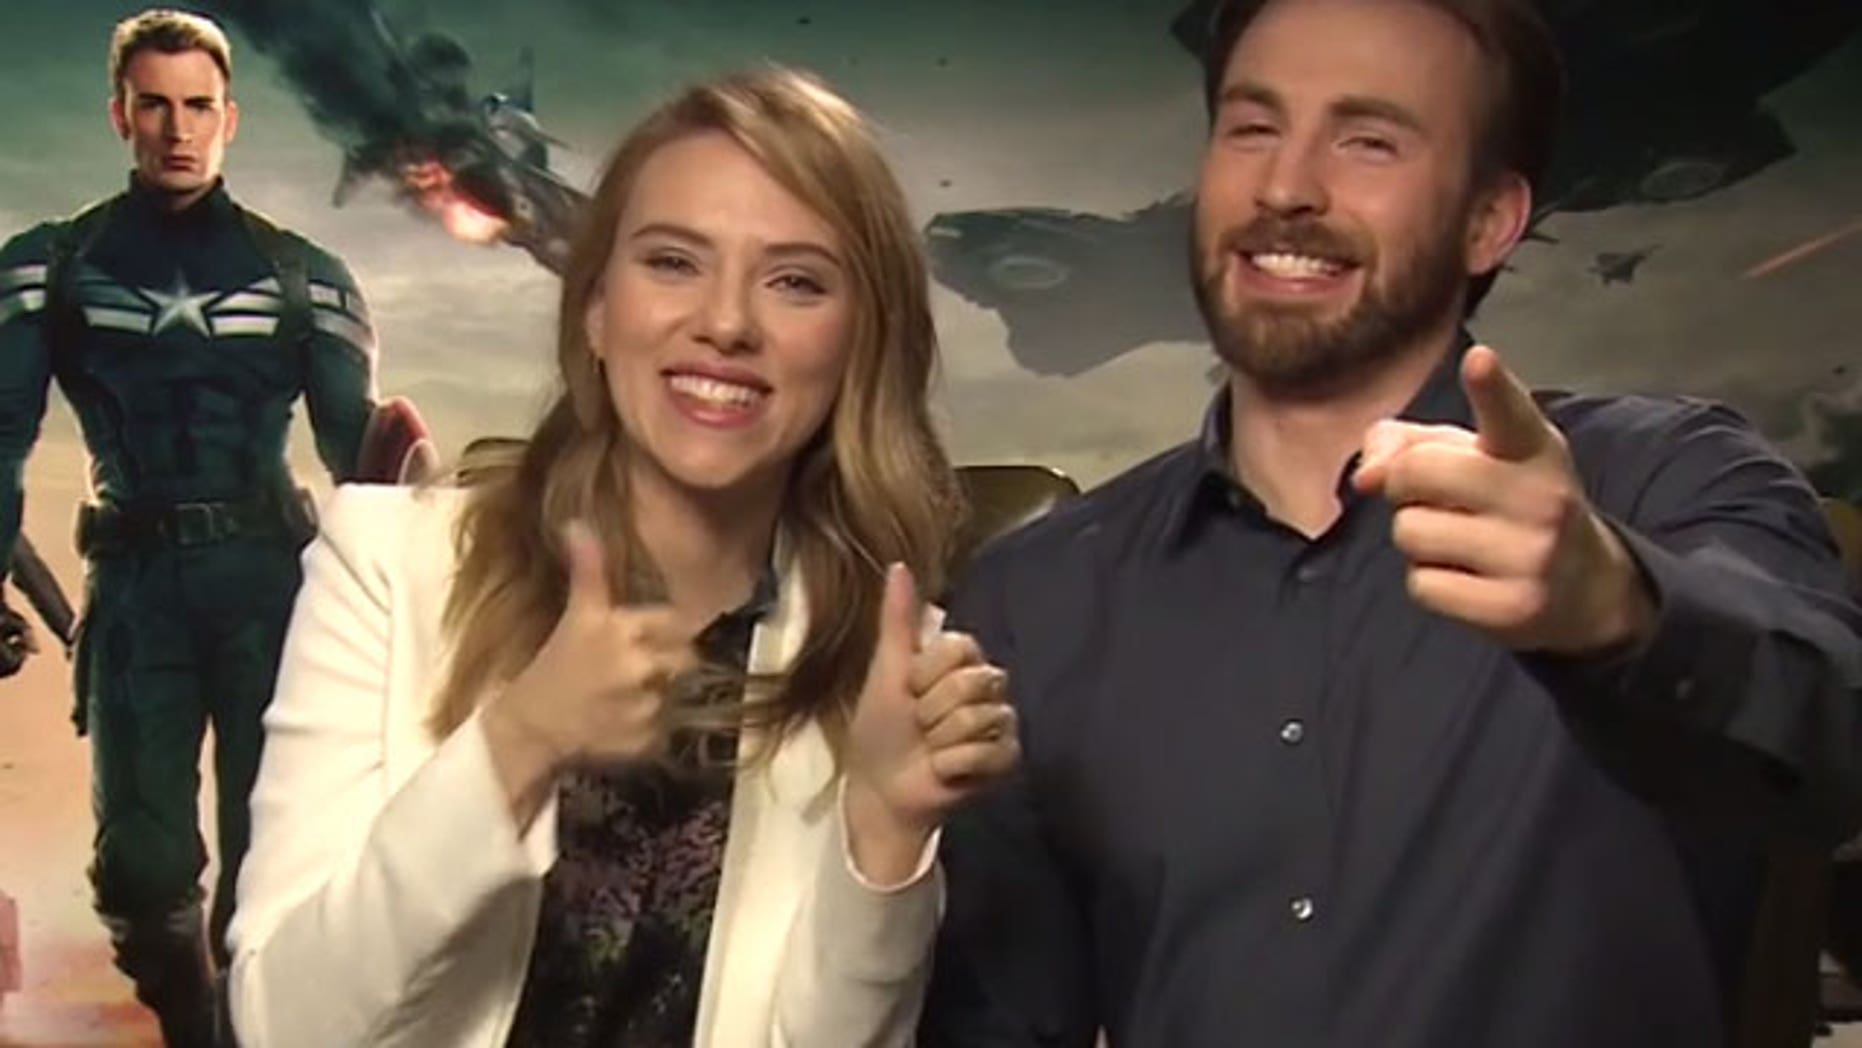 Scarlett Johansson and Chris Evans in viral wedding video.